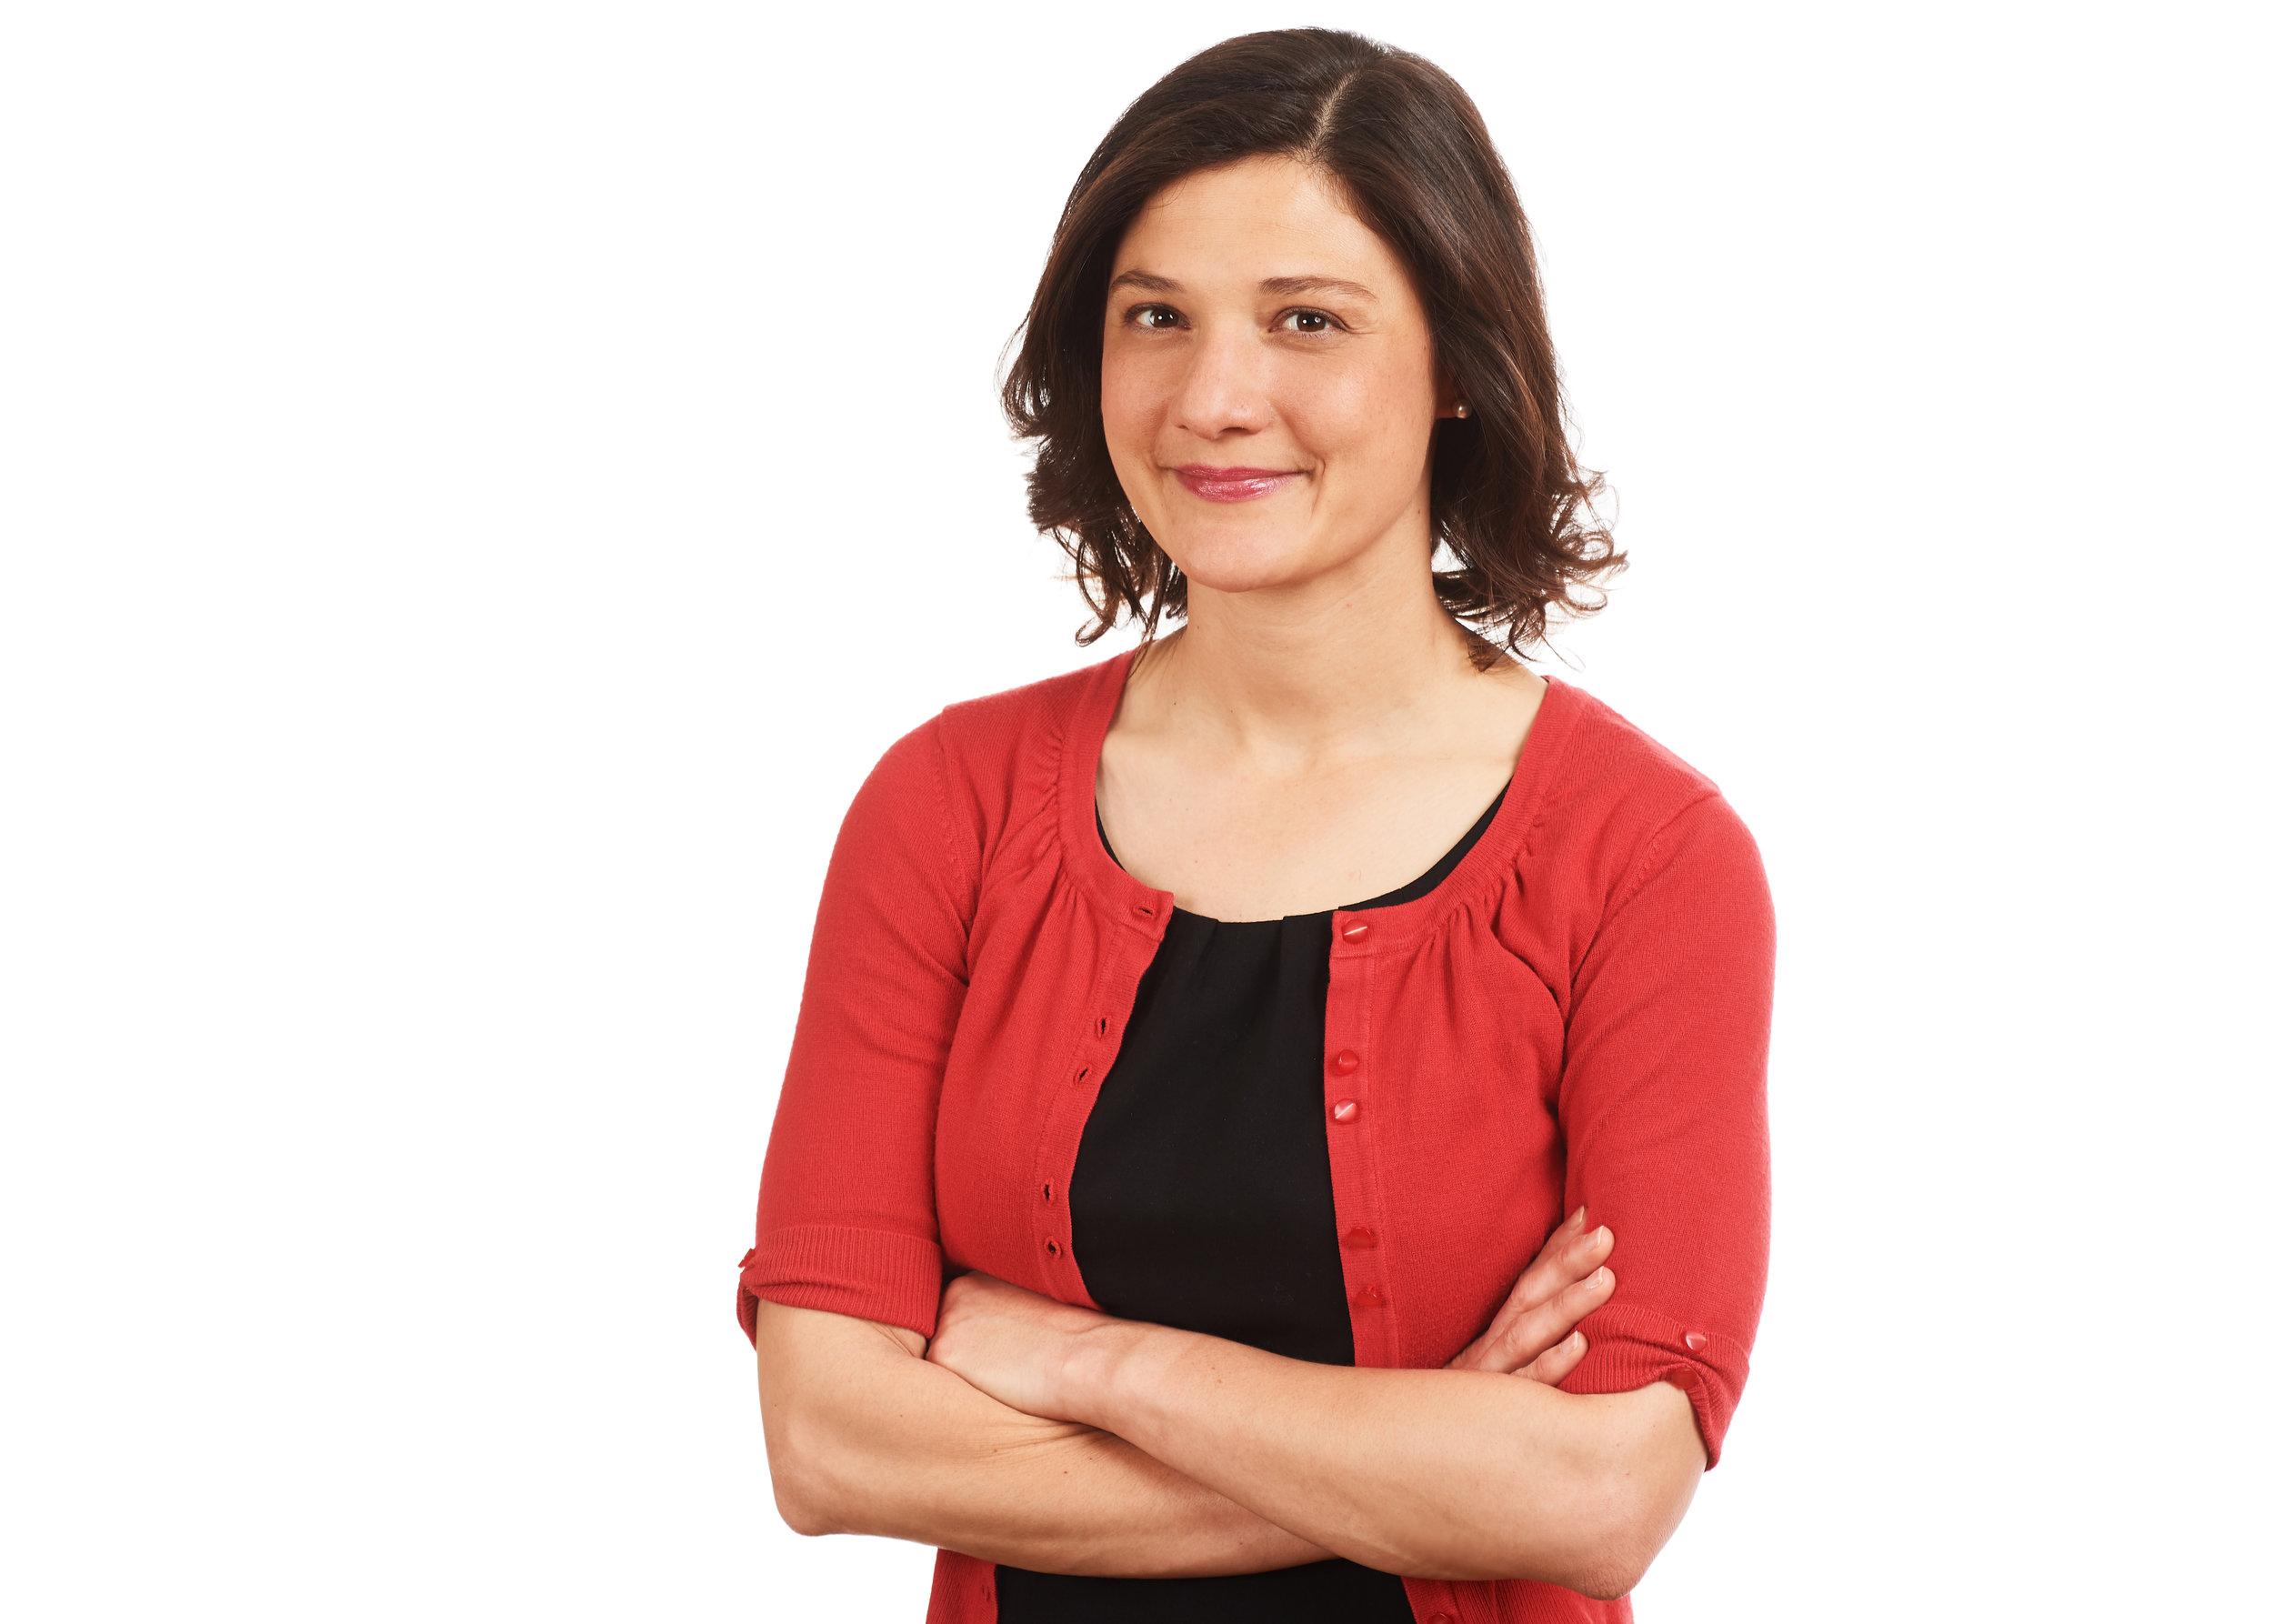 KRISTINA M. HUGAR, PhD